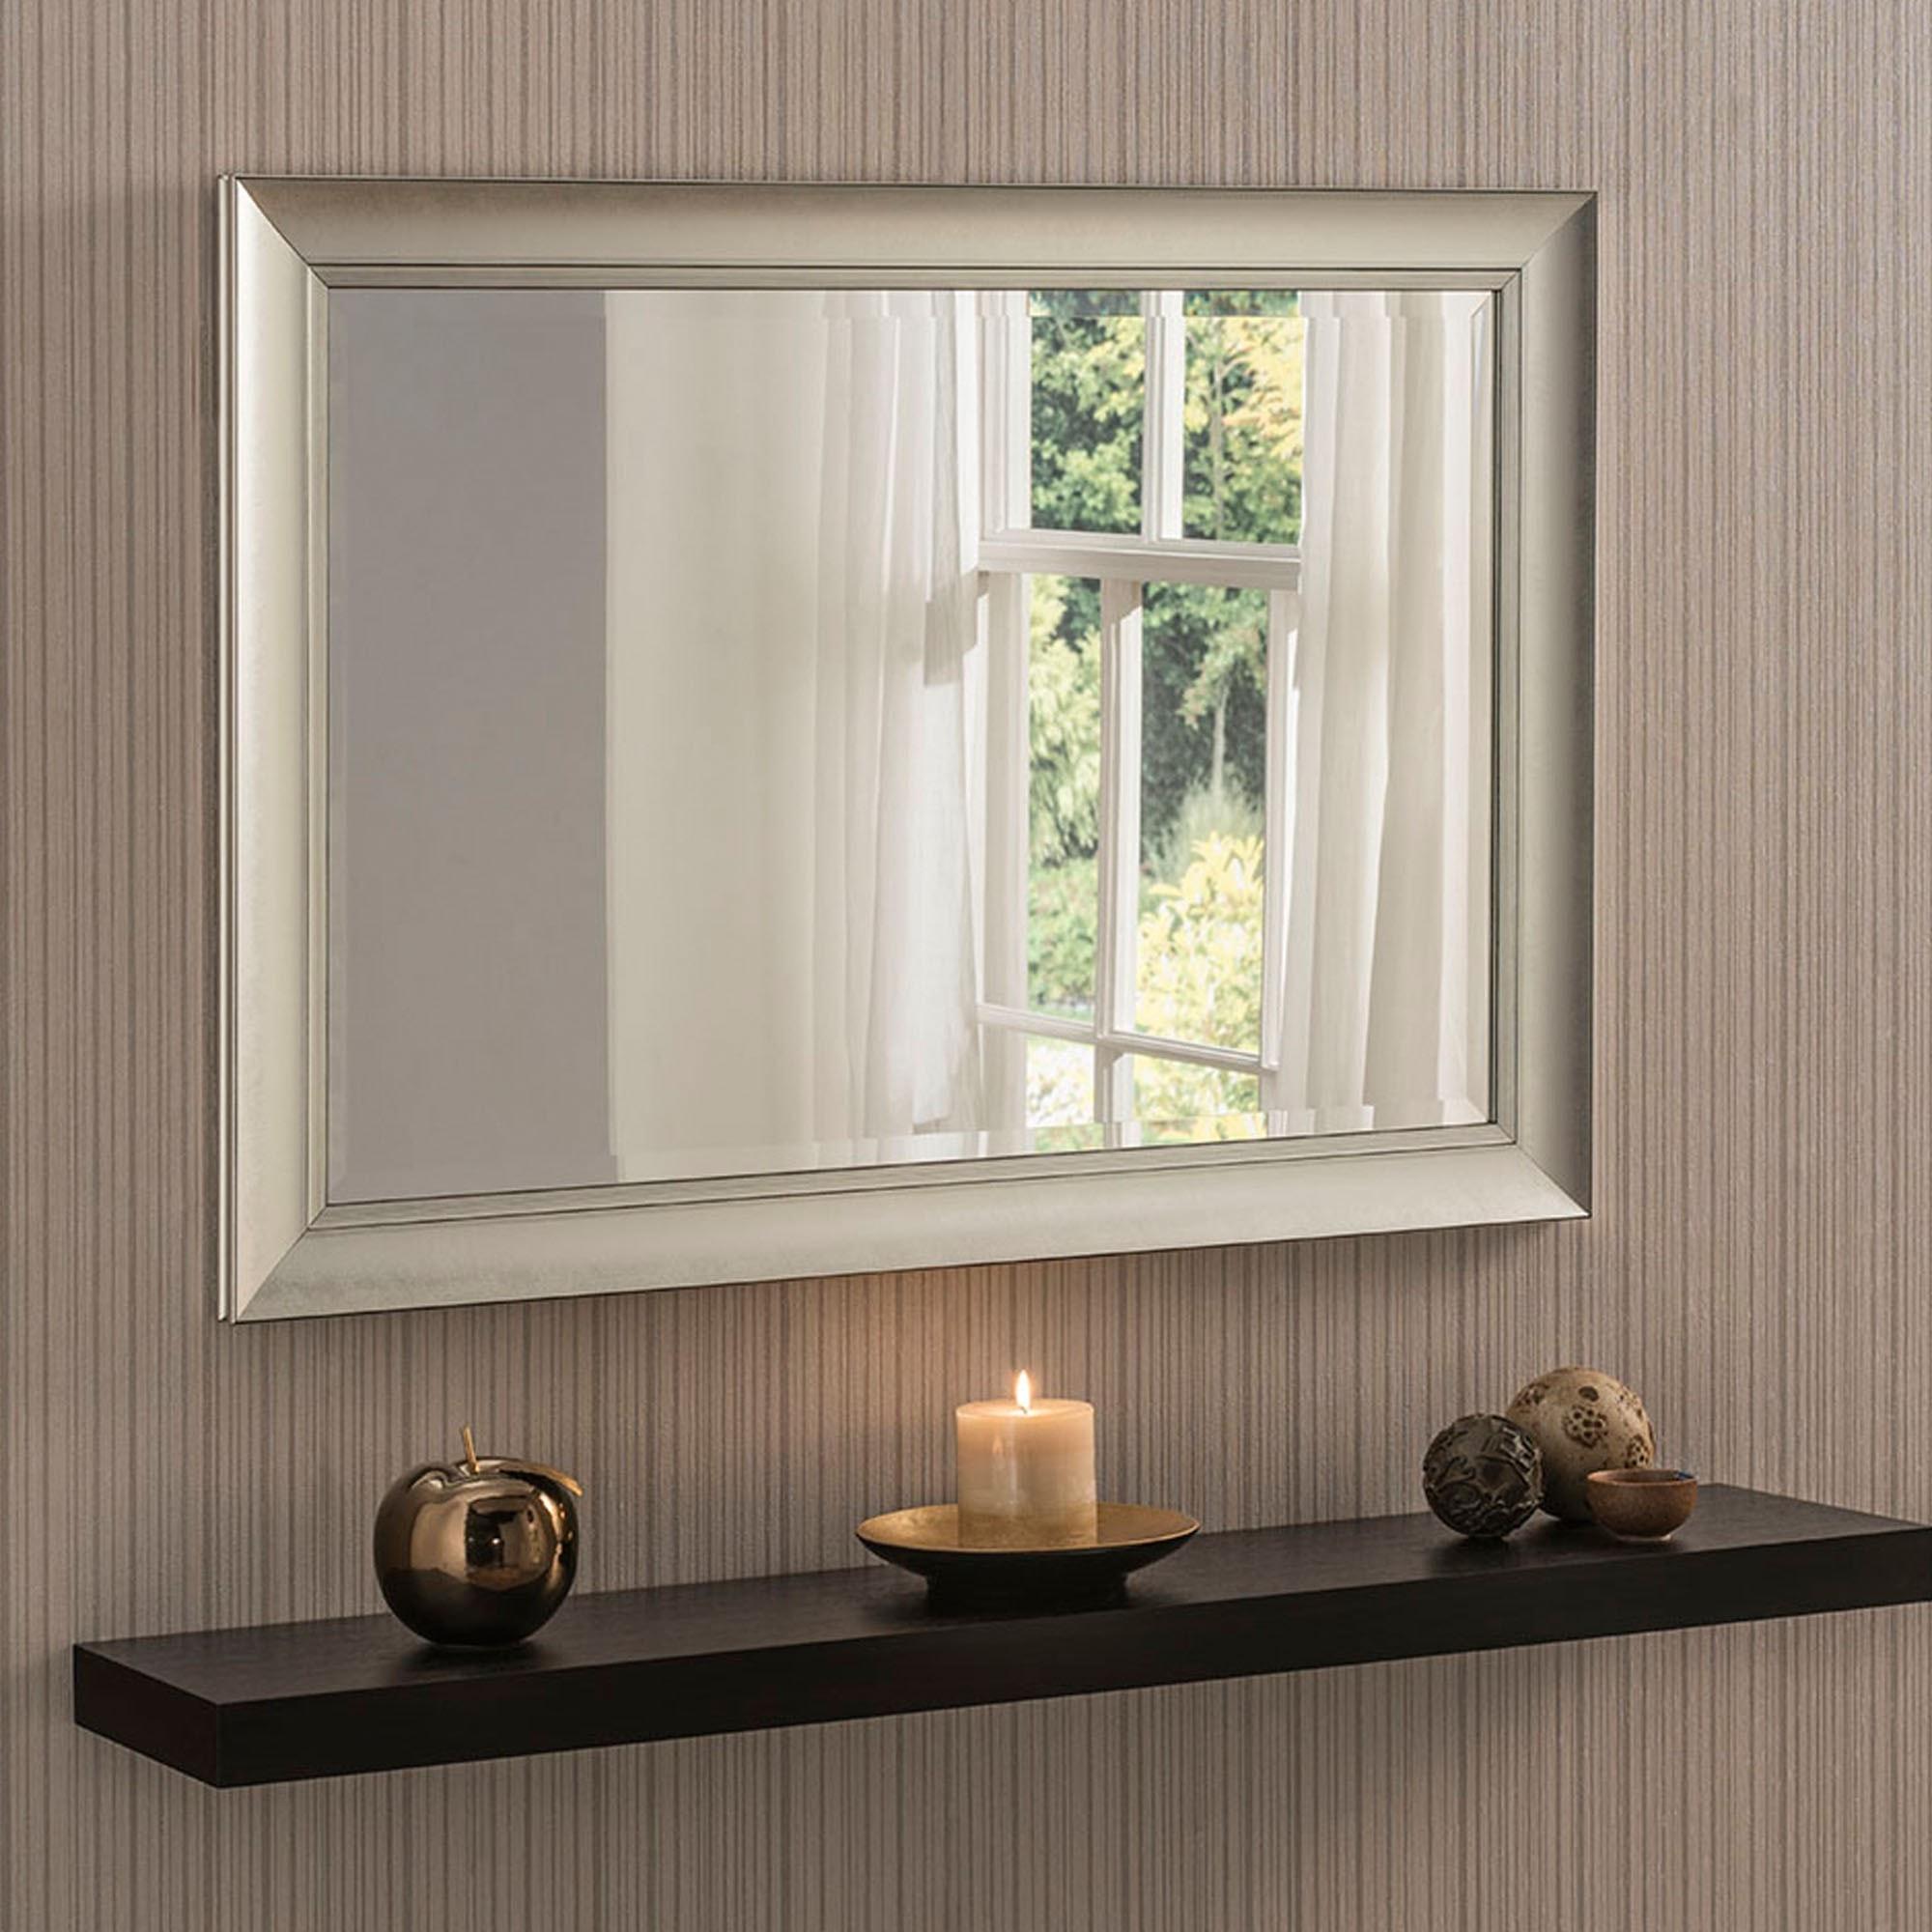 Contemporary Silver Beveled Wall Mirror Wall Mirrors